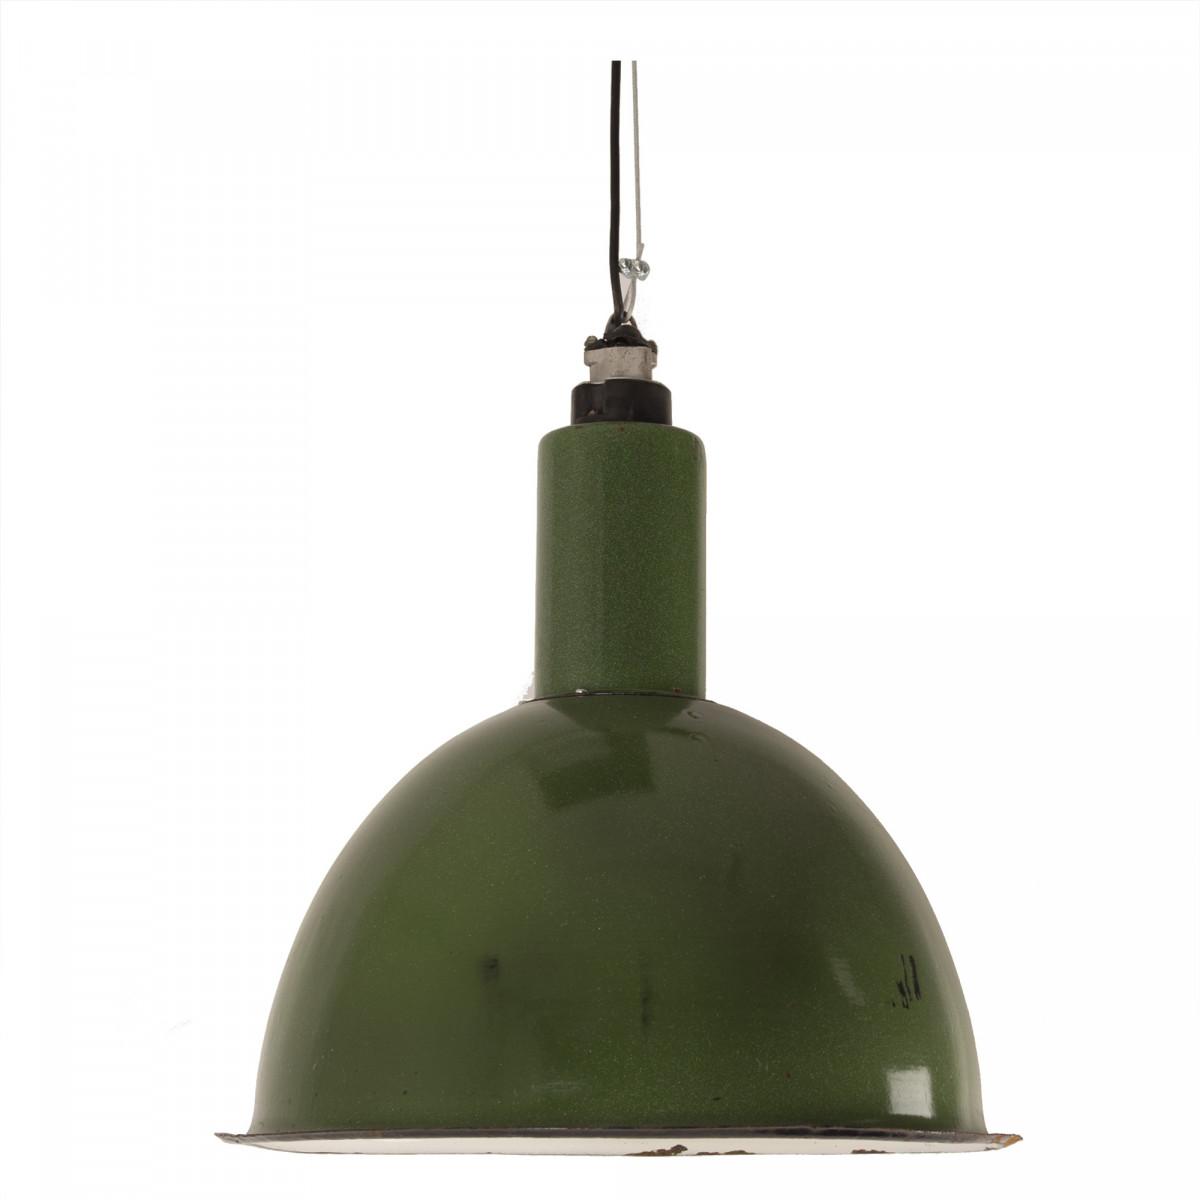 fabriekslamp-3-1200x1200